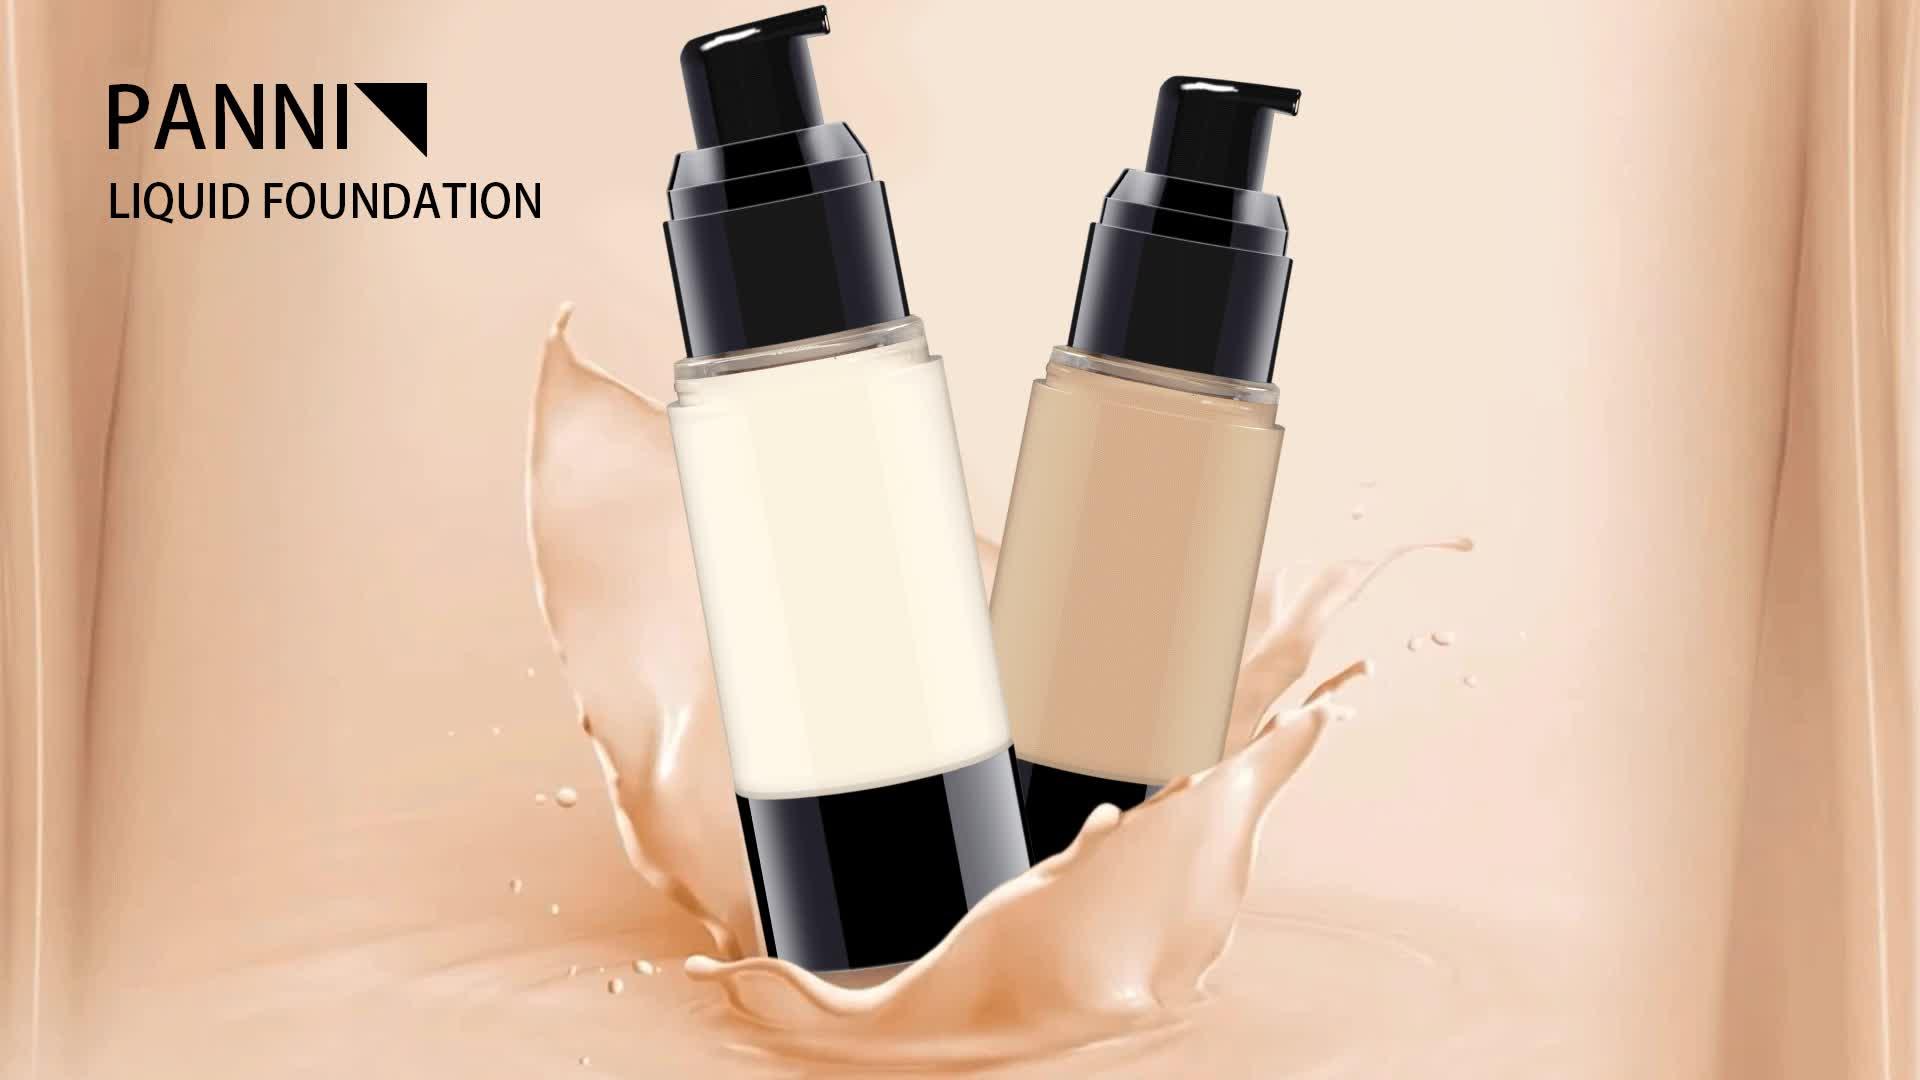 Cakupan Penuh Tahan Lama untuk Semua Jenis Kulit Liquid Makeup Foundation